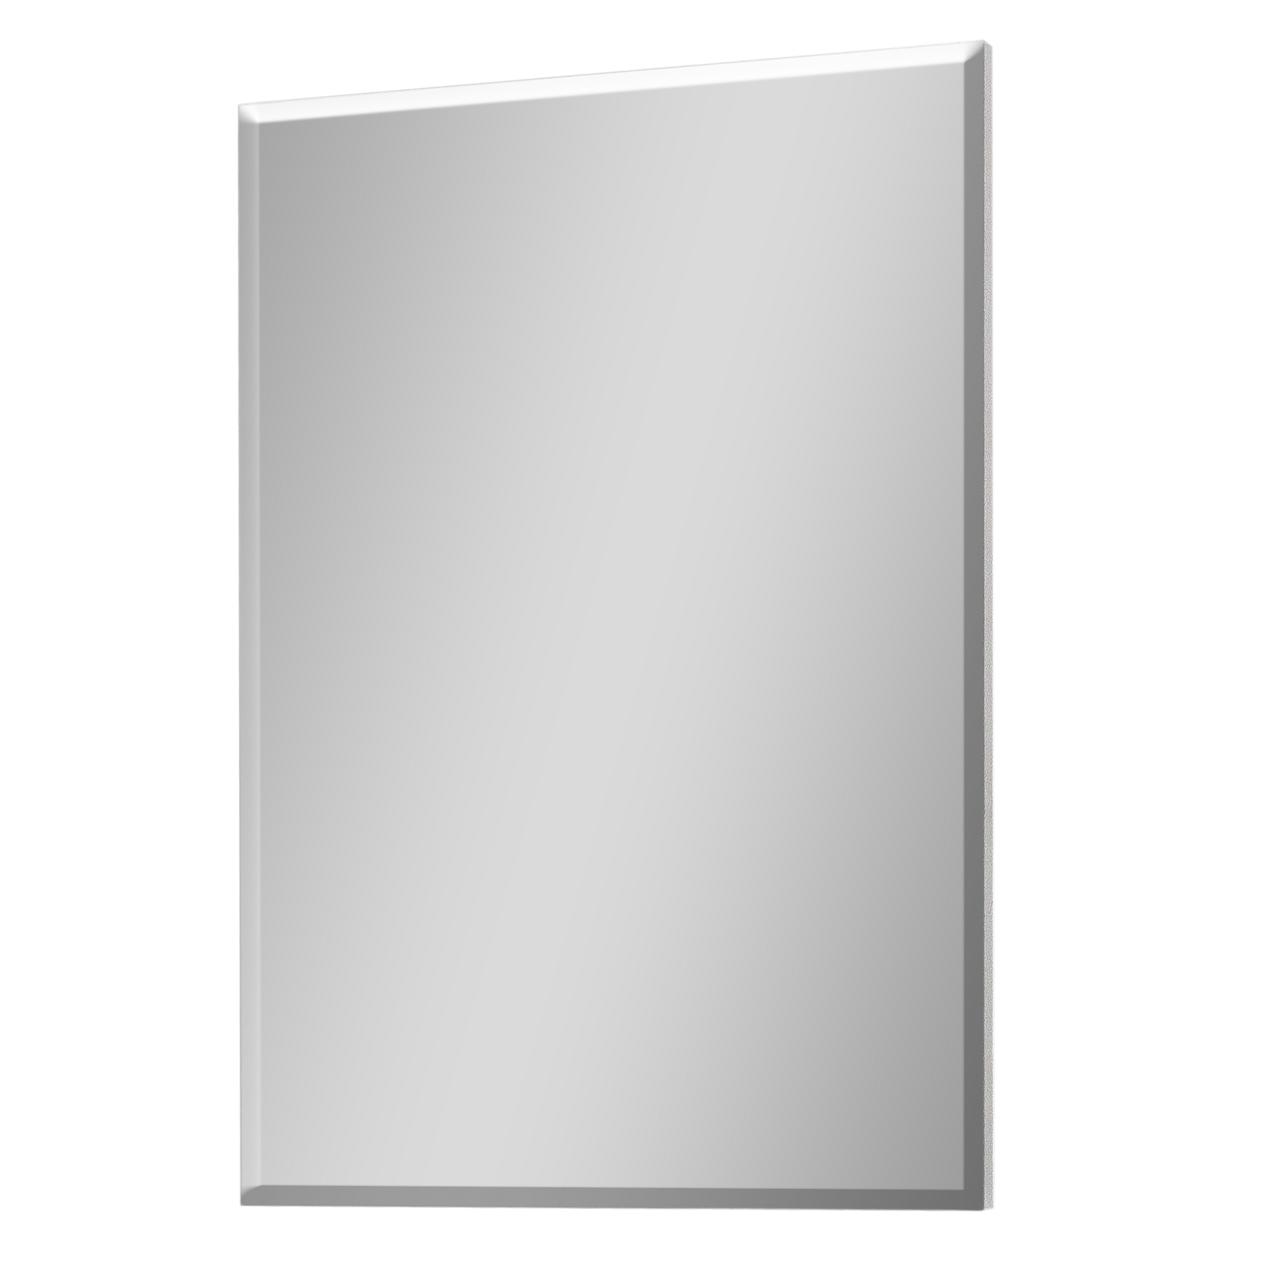 Зеркало для ванной комнаты Эко Z-50 (без подсветки) Юввис